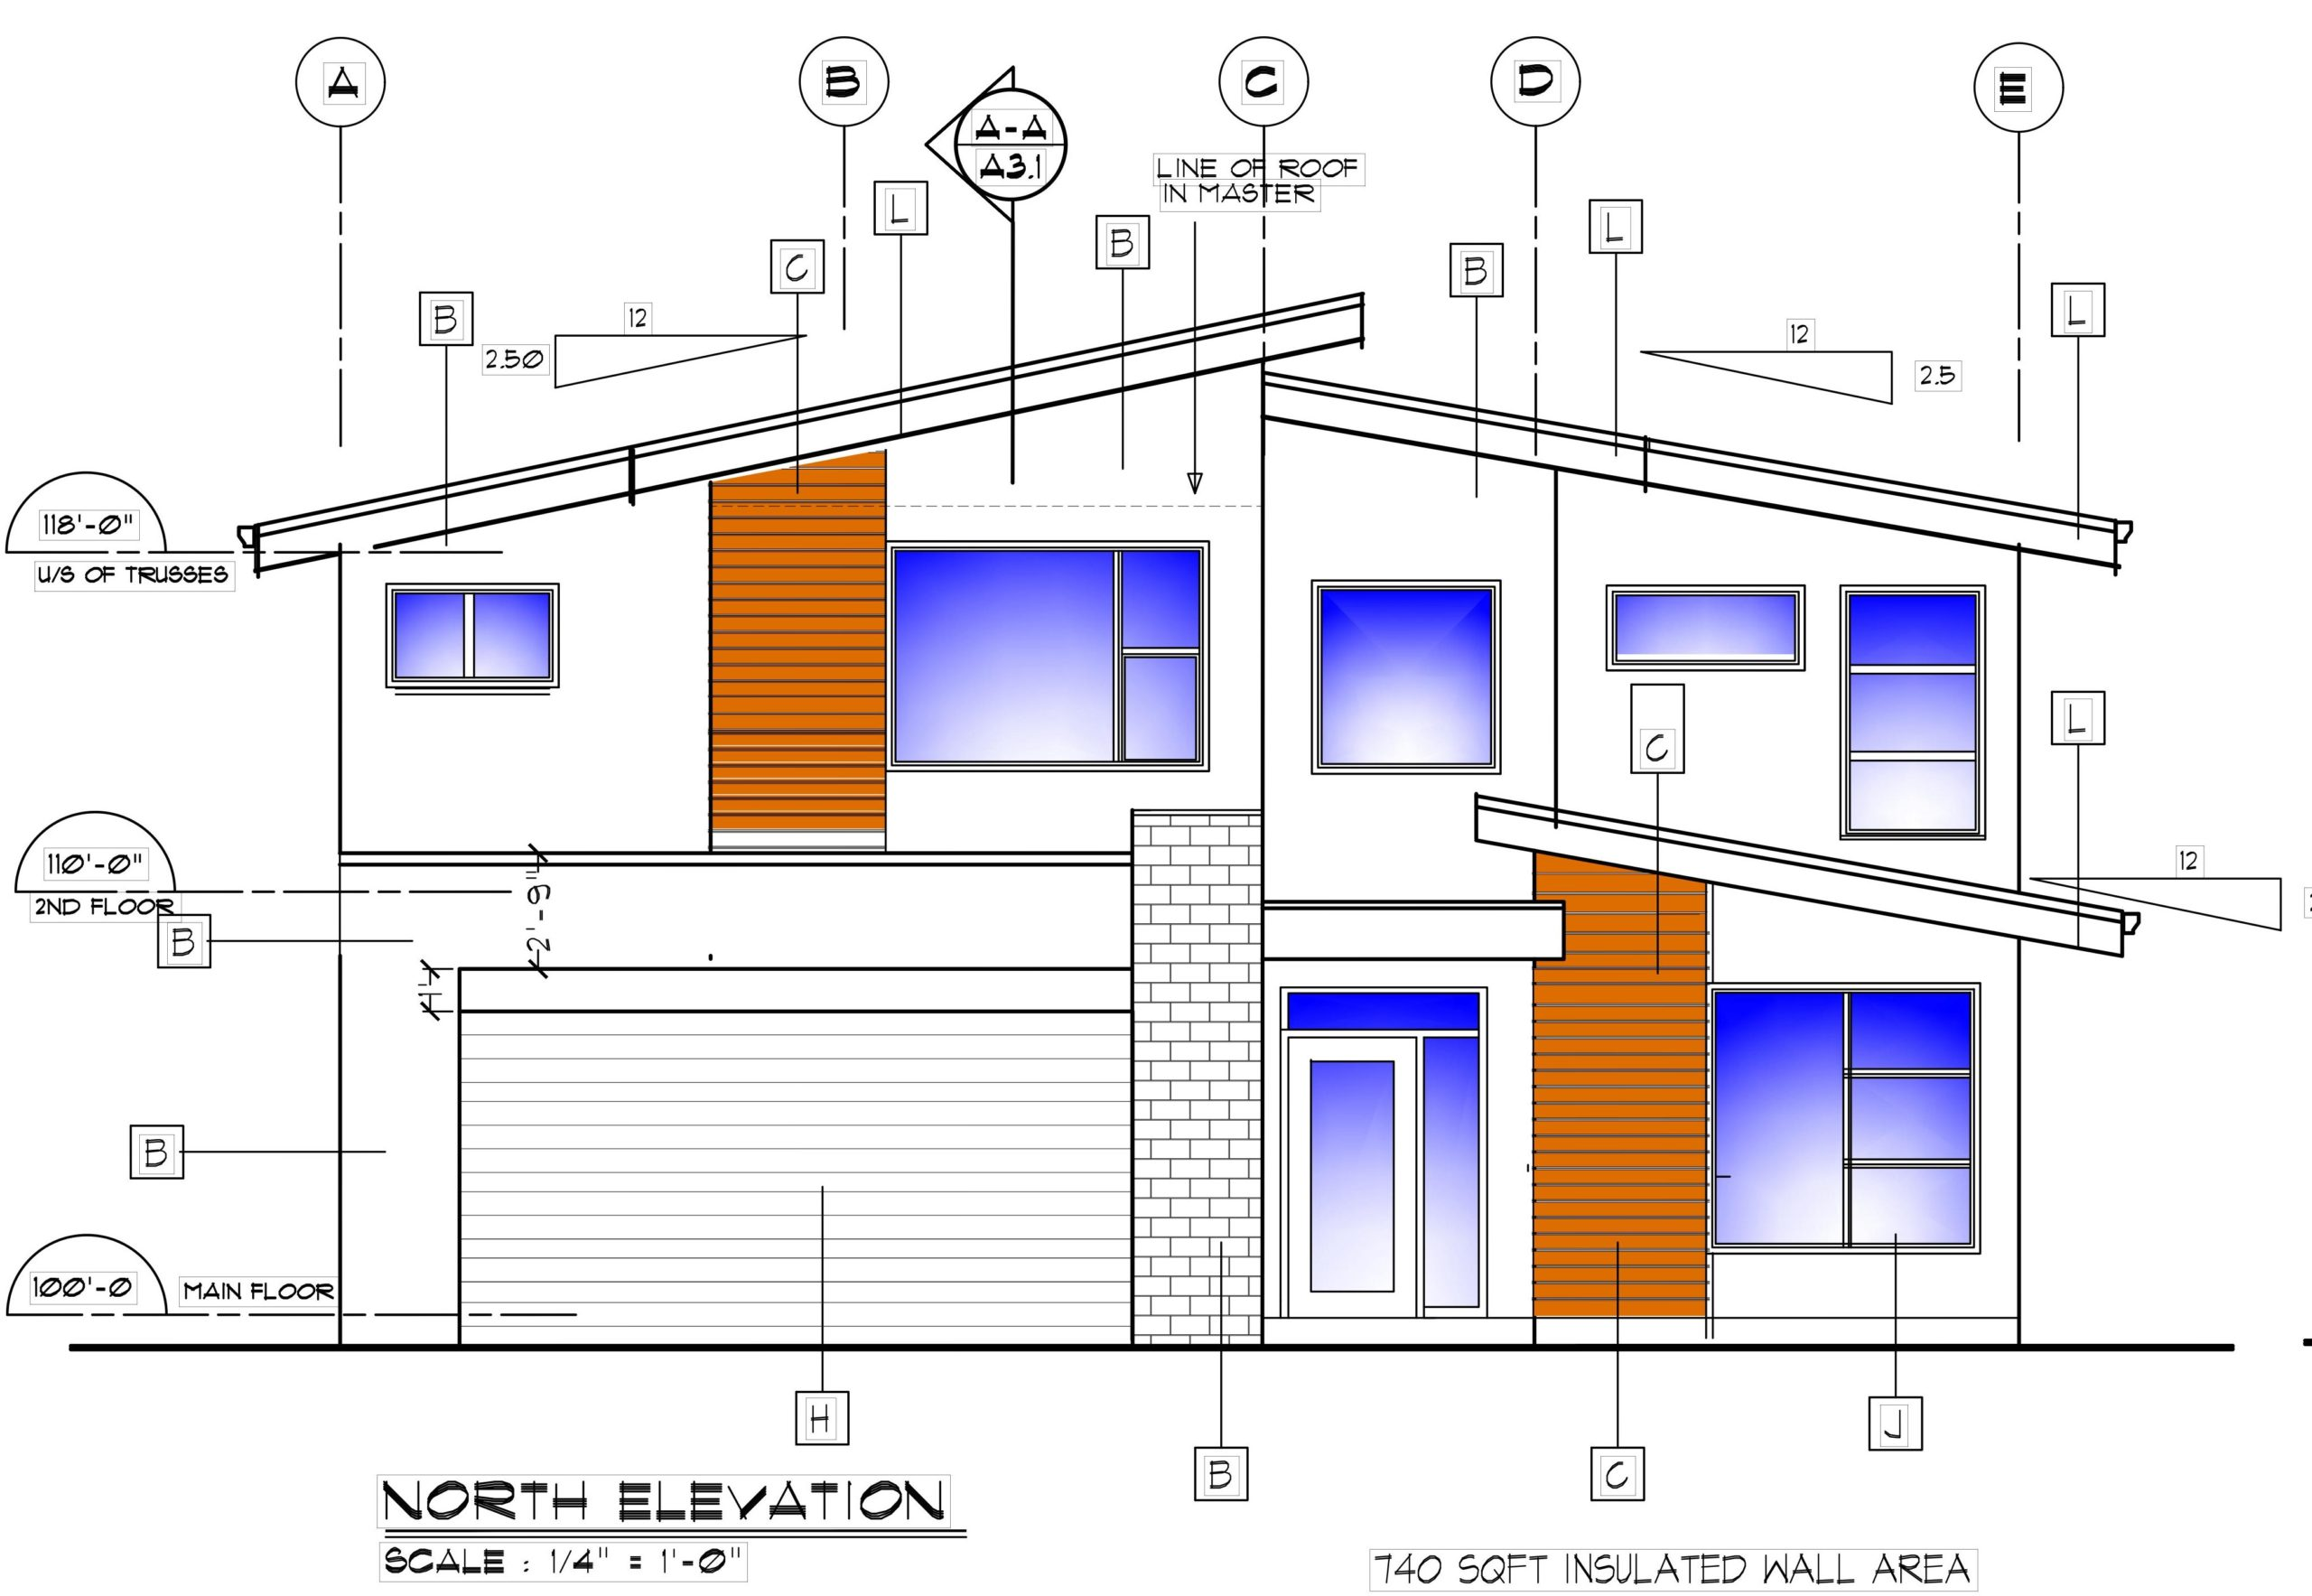 481 Edinburgh Blvd, Aberdeen, Kamloops Real Estate for Sale